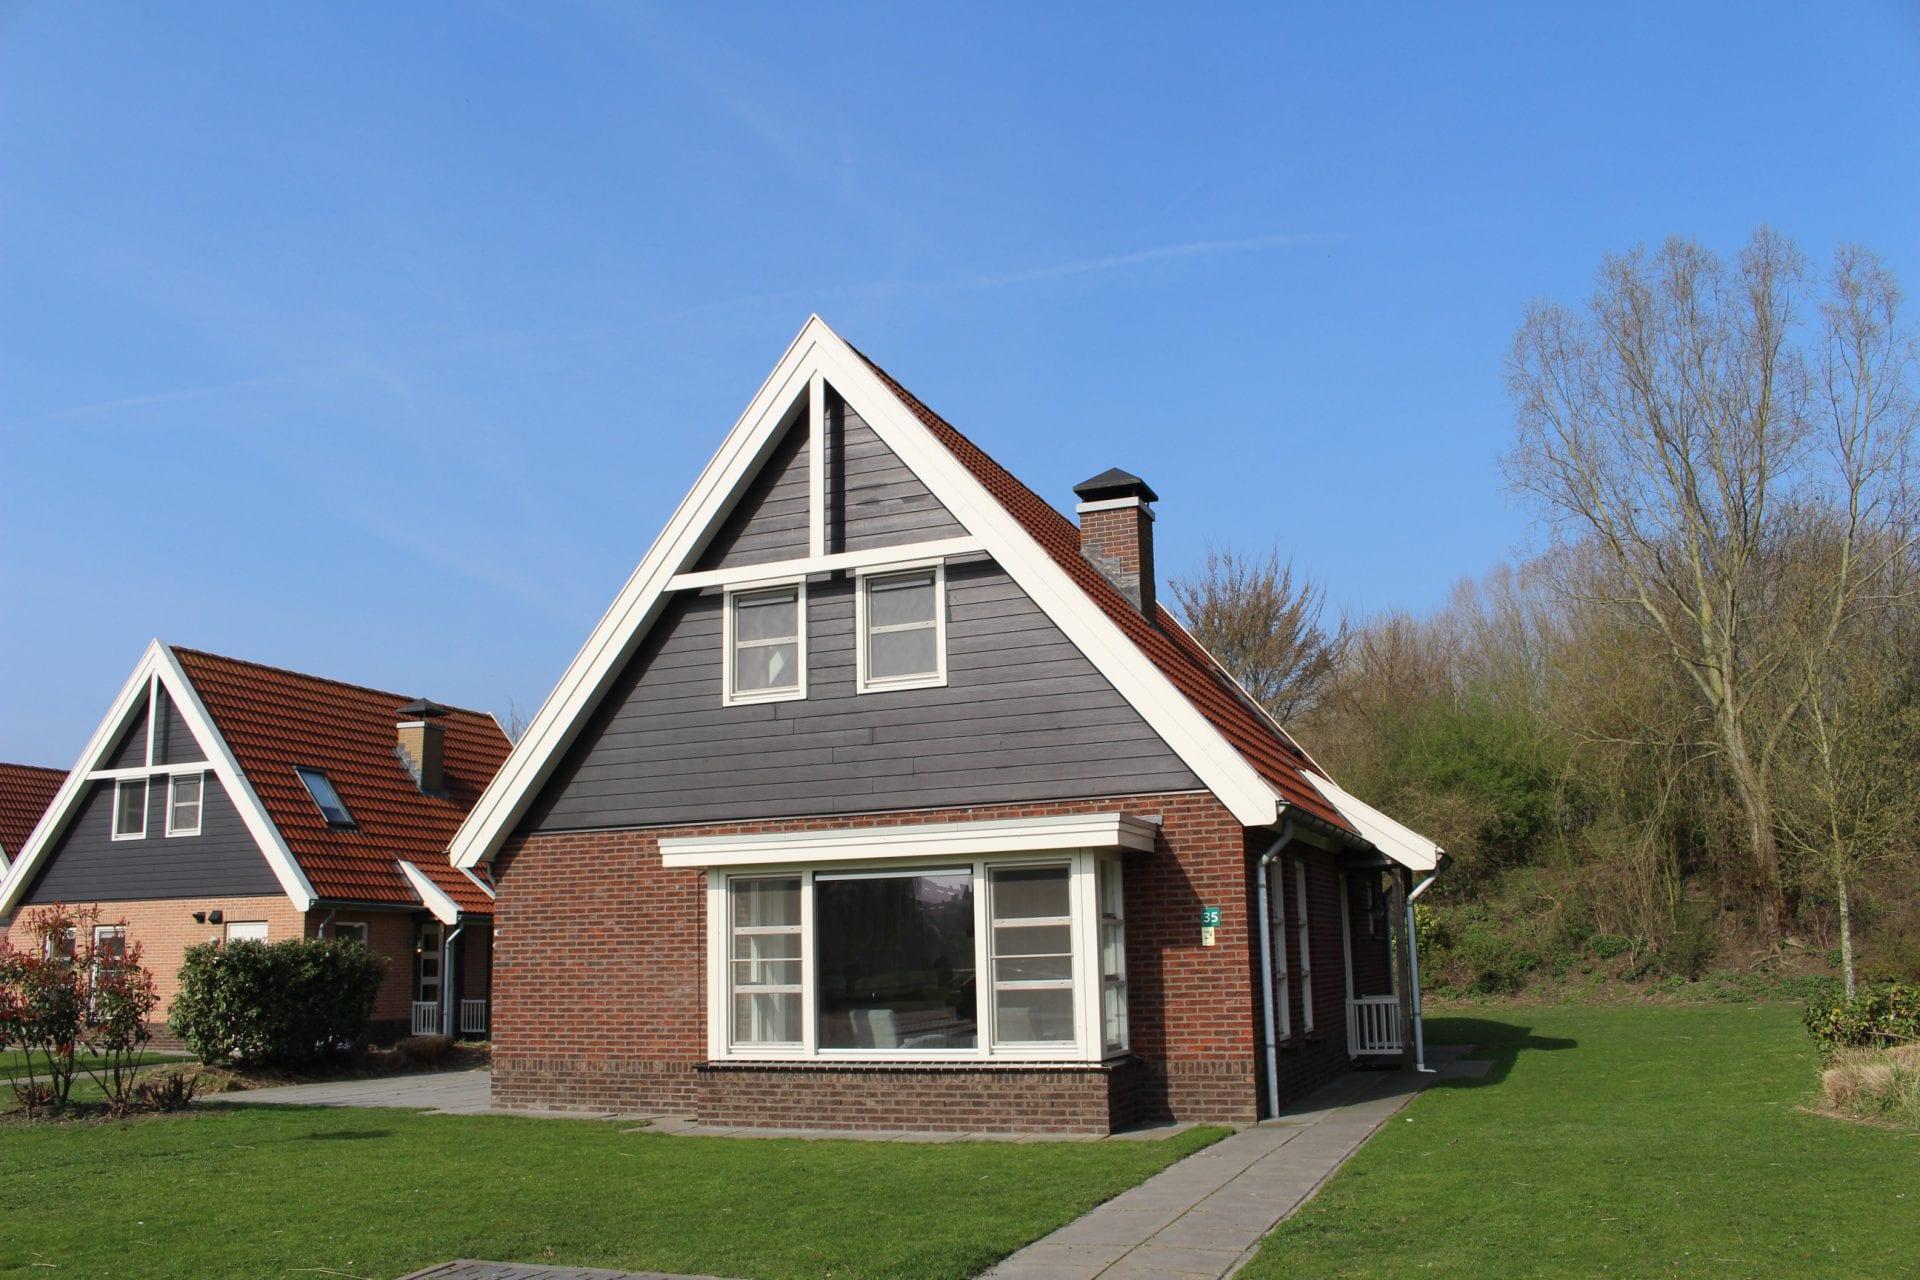 1 Vakantiehuis 1035 Waterparc Veluwemeer 6-pers.